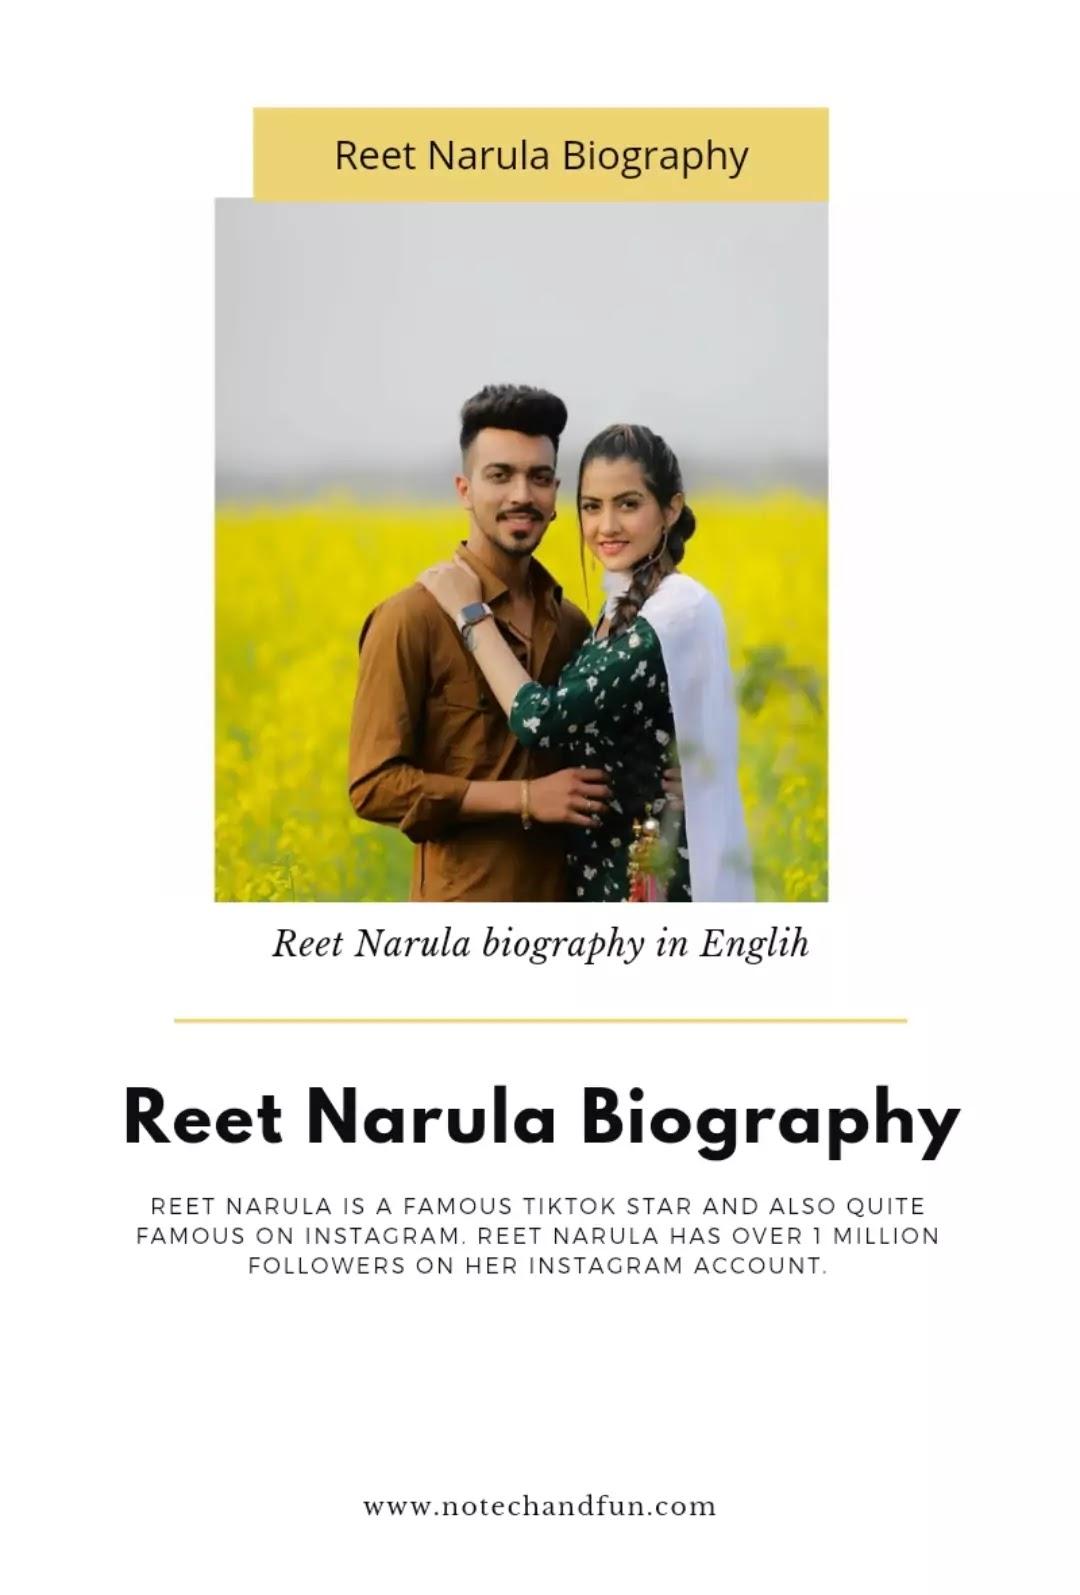 Reet Narula biography